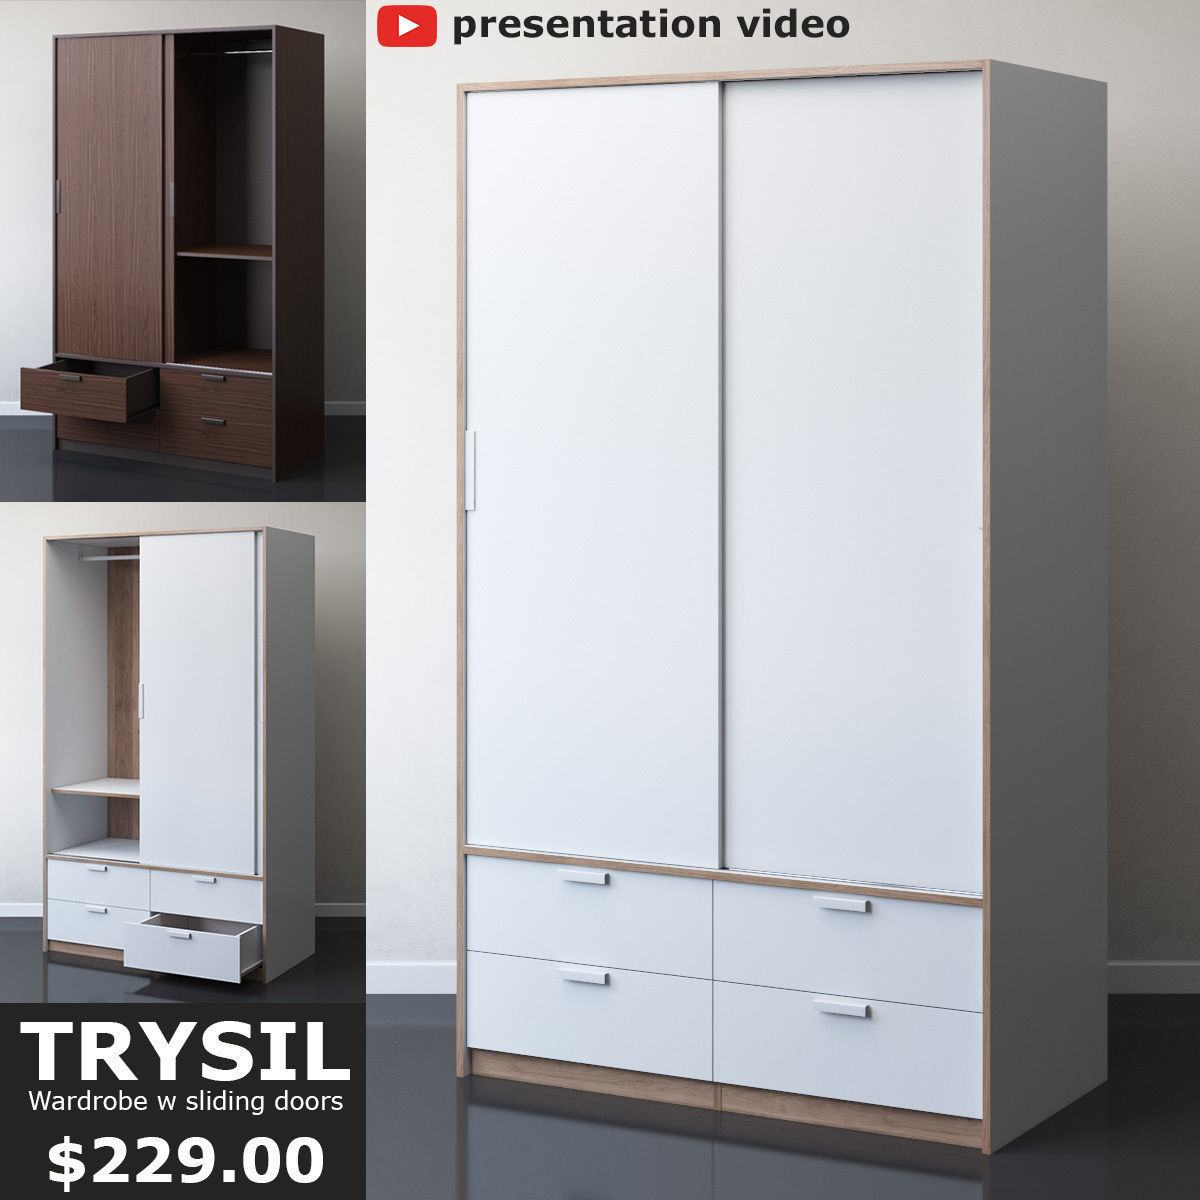 Ikea Trysil Wardrobe With Sliding Doors 3d Model